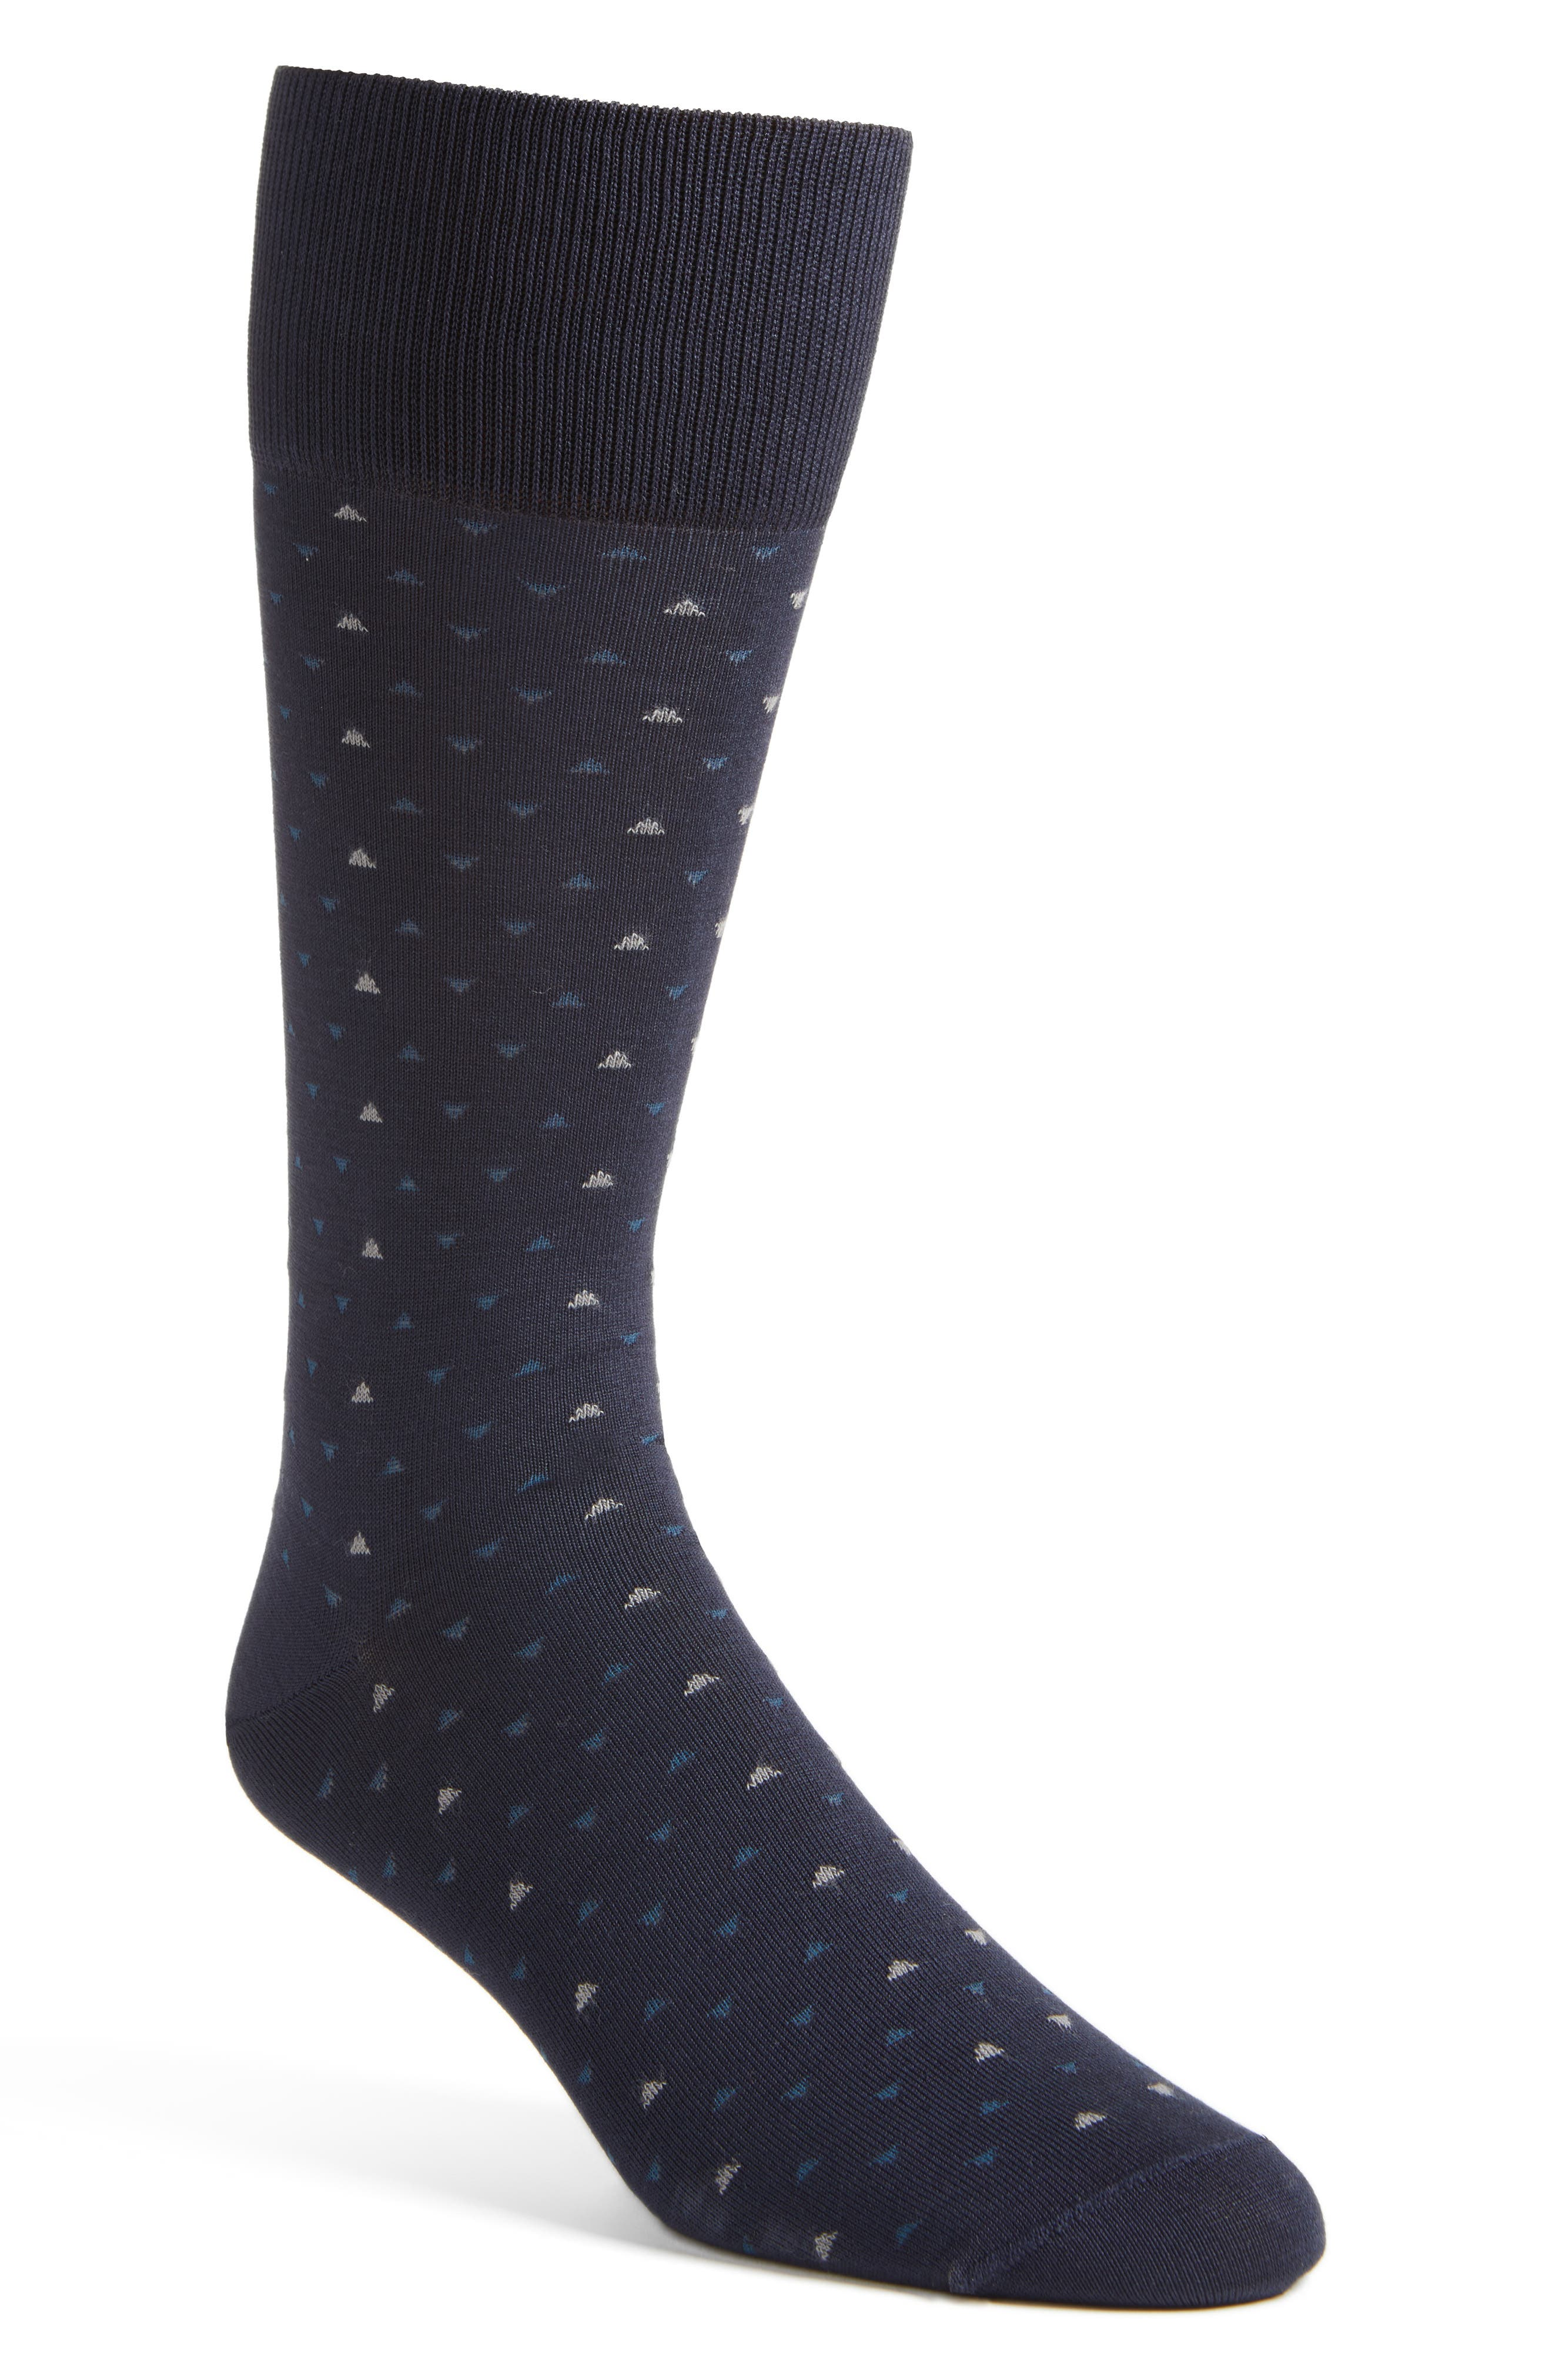 Alternate Image 1 Selected - John W. Nordstrom® Over the Calf Cascading Triangles Socks